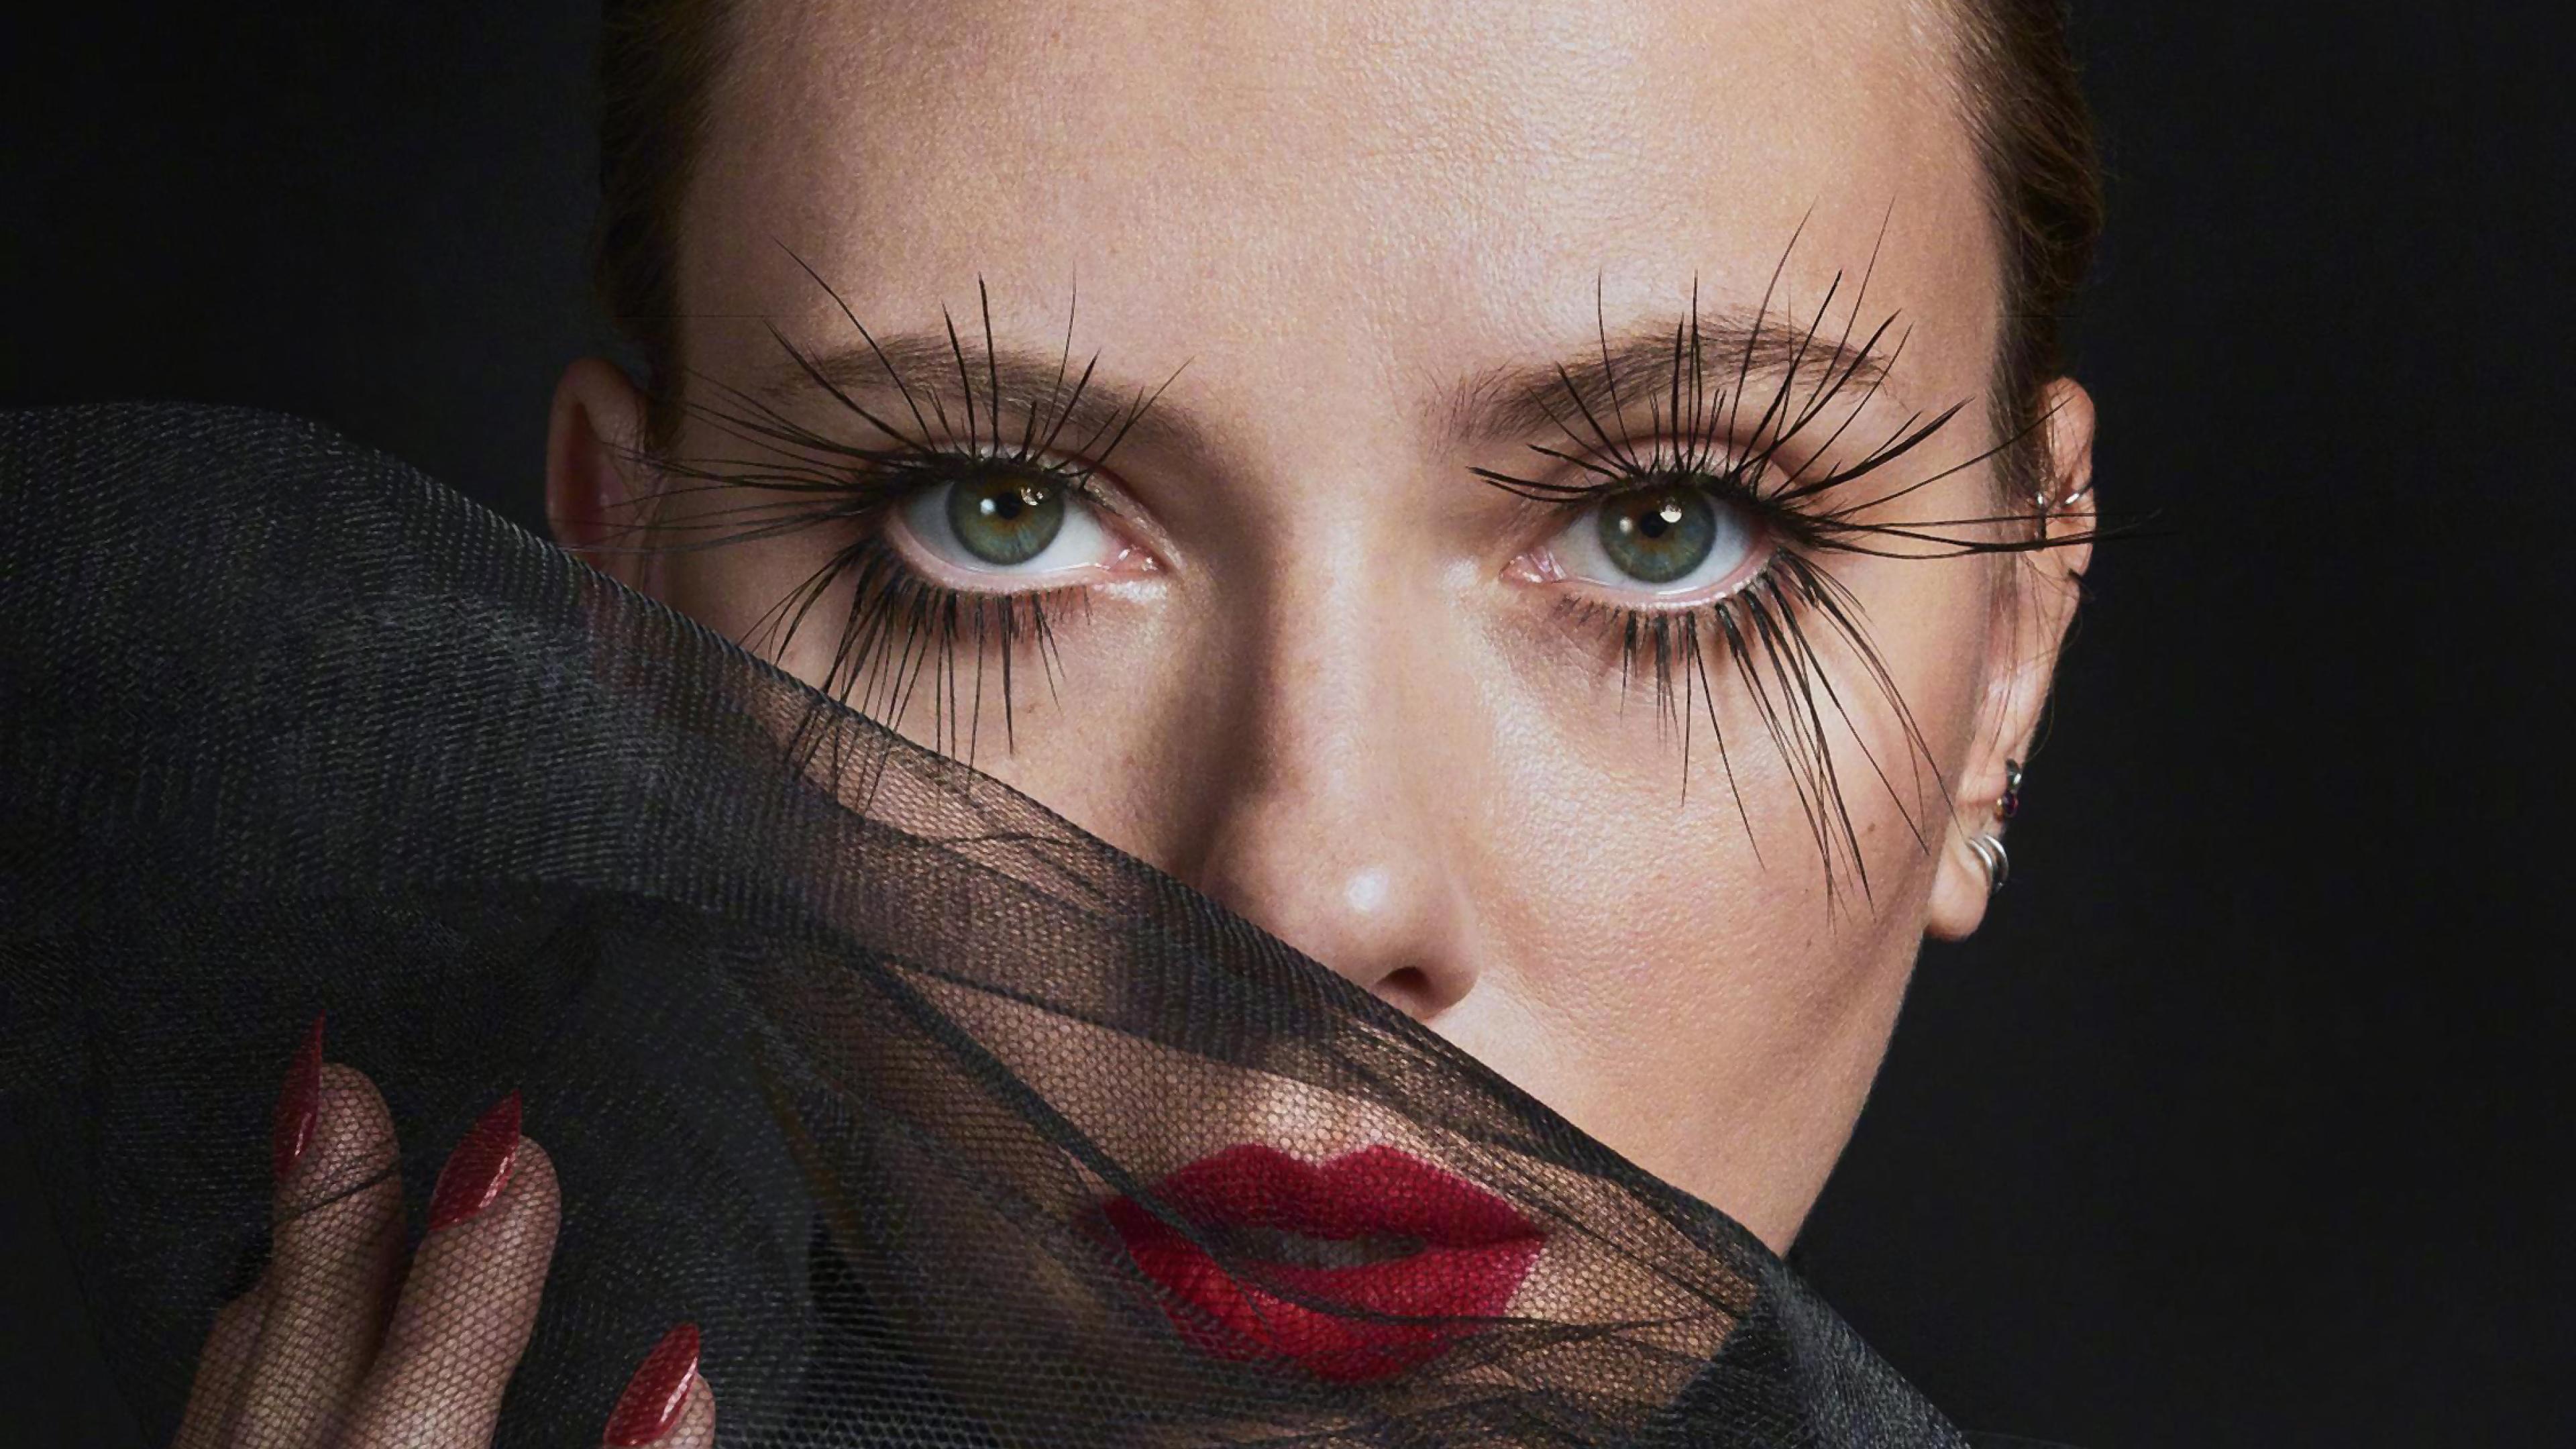 3840x2160 Scarlett Johansson Black Widow Photoshoot 4k Wallpaper Hd Celebrities 4k Wallpapers Images Photos And Background